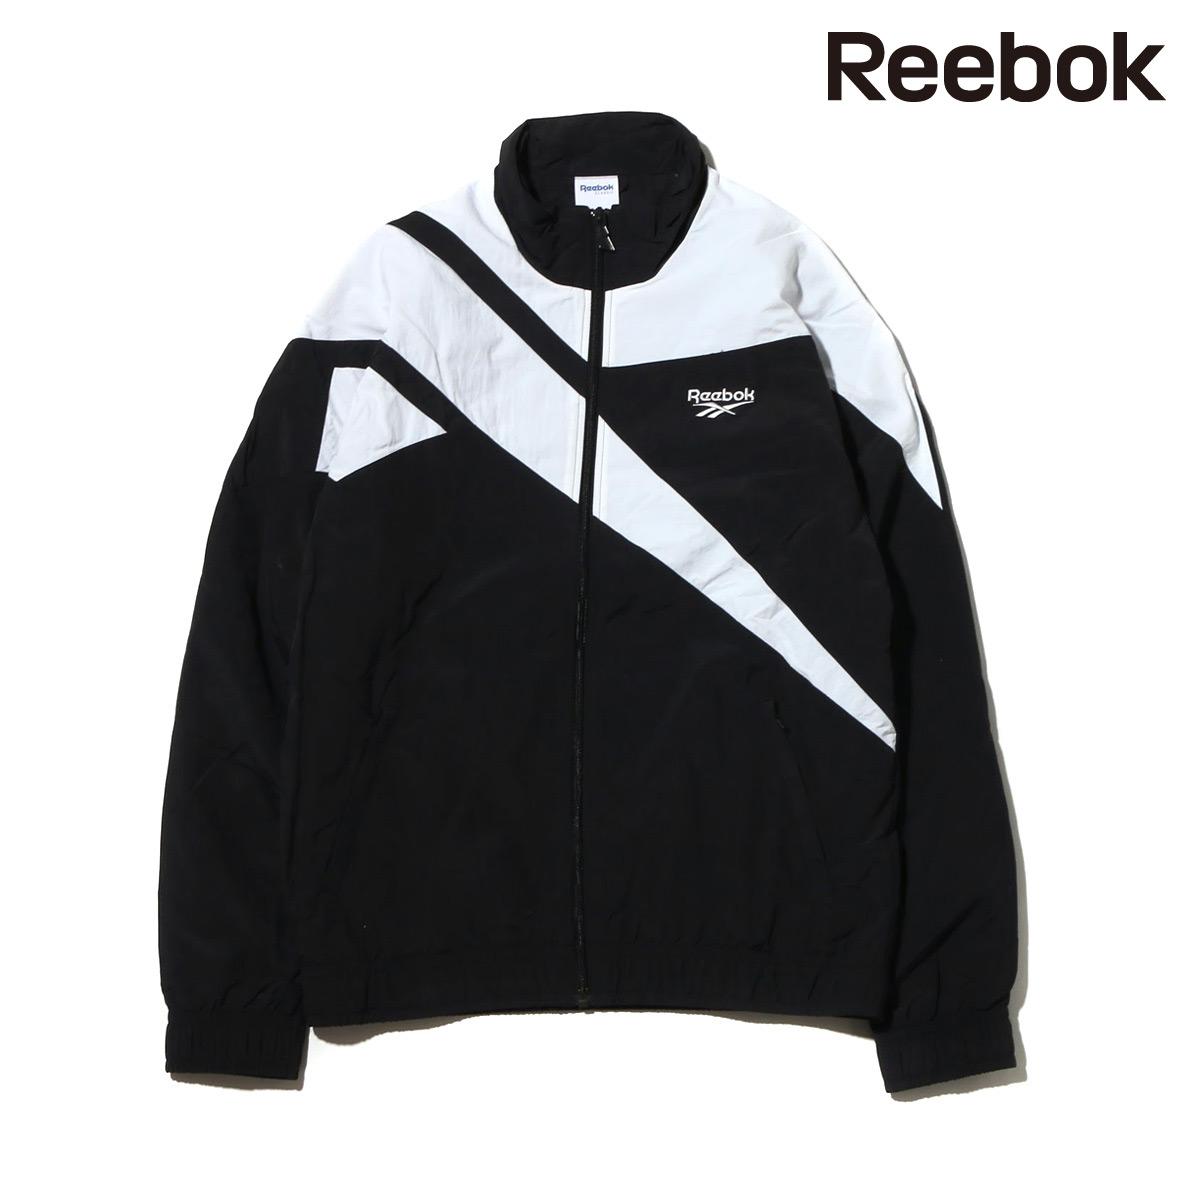 Reebok LF VECTOR TRACKTOP(BLACK/WHITE)(リーボック ロスト&ファウンド ベクター トラックトップ )【メンズ】【ジャケット】【18SS-S】